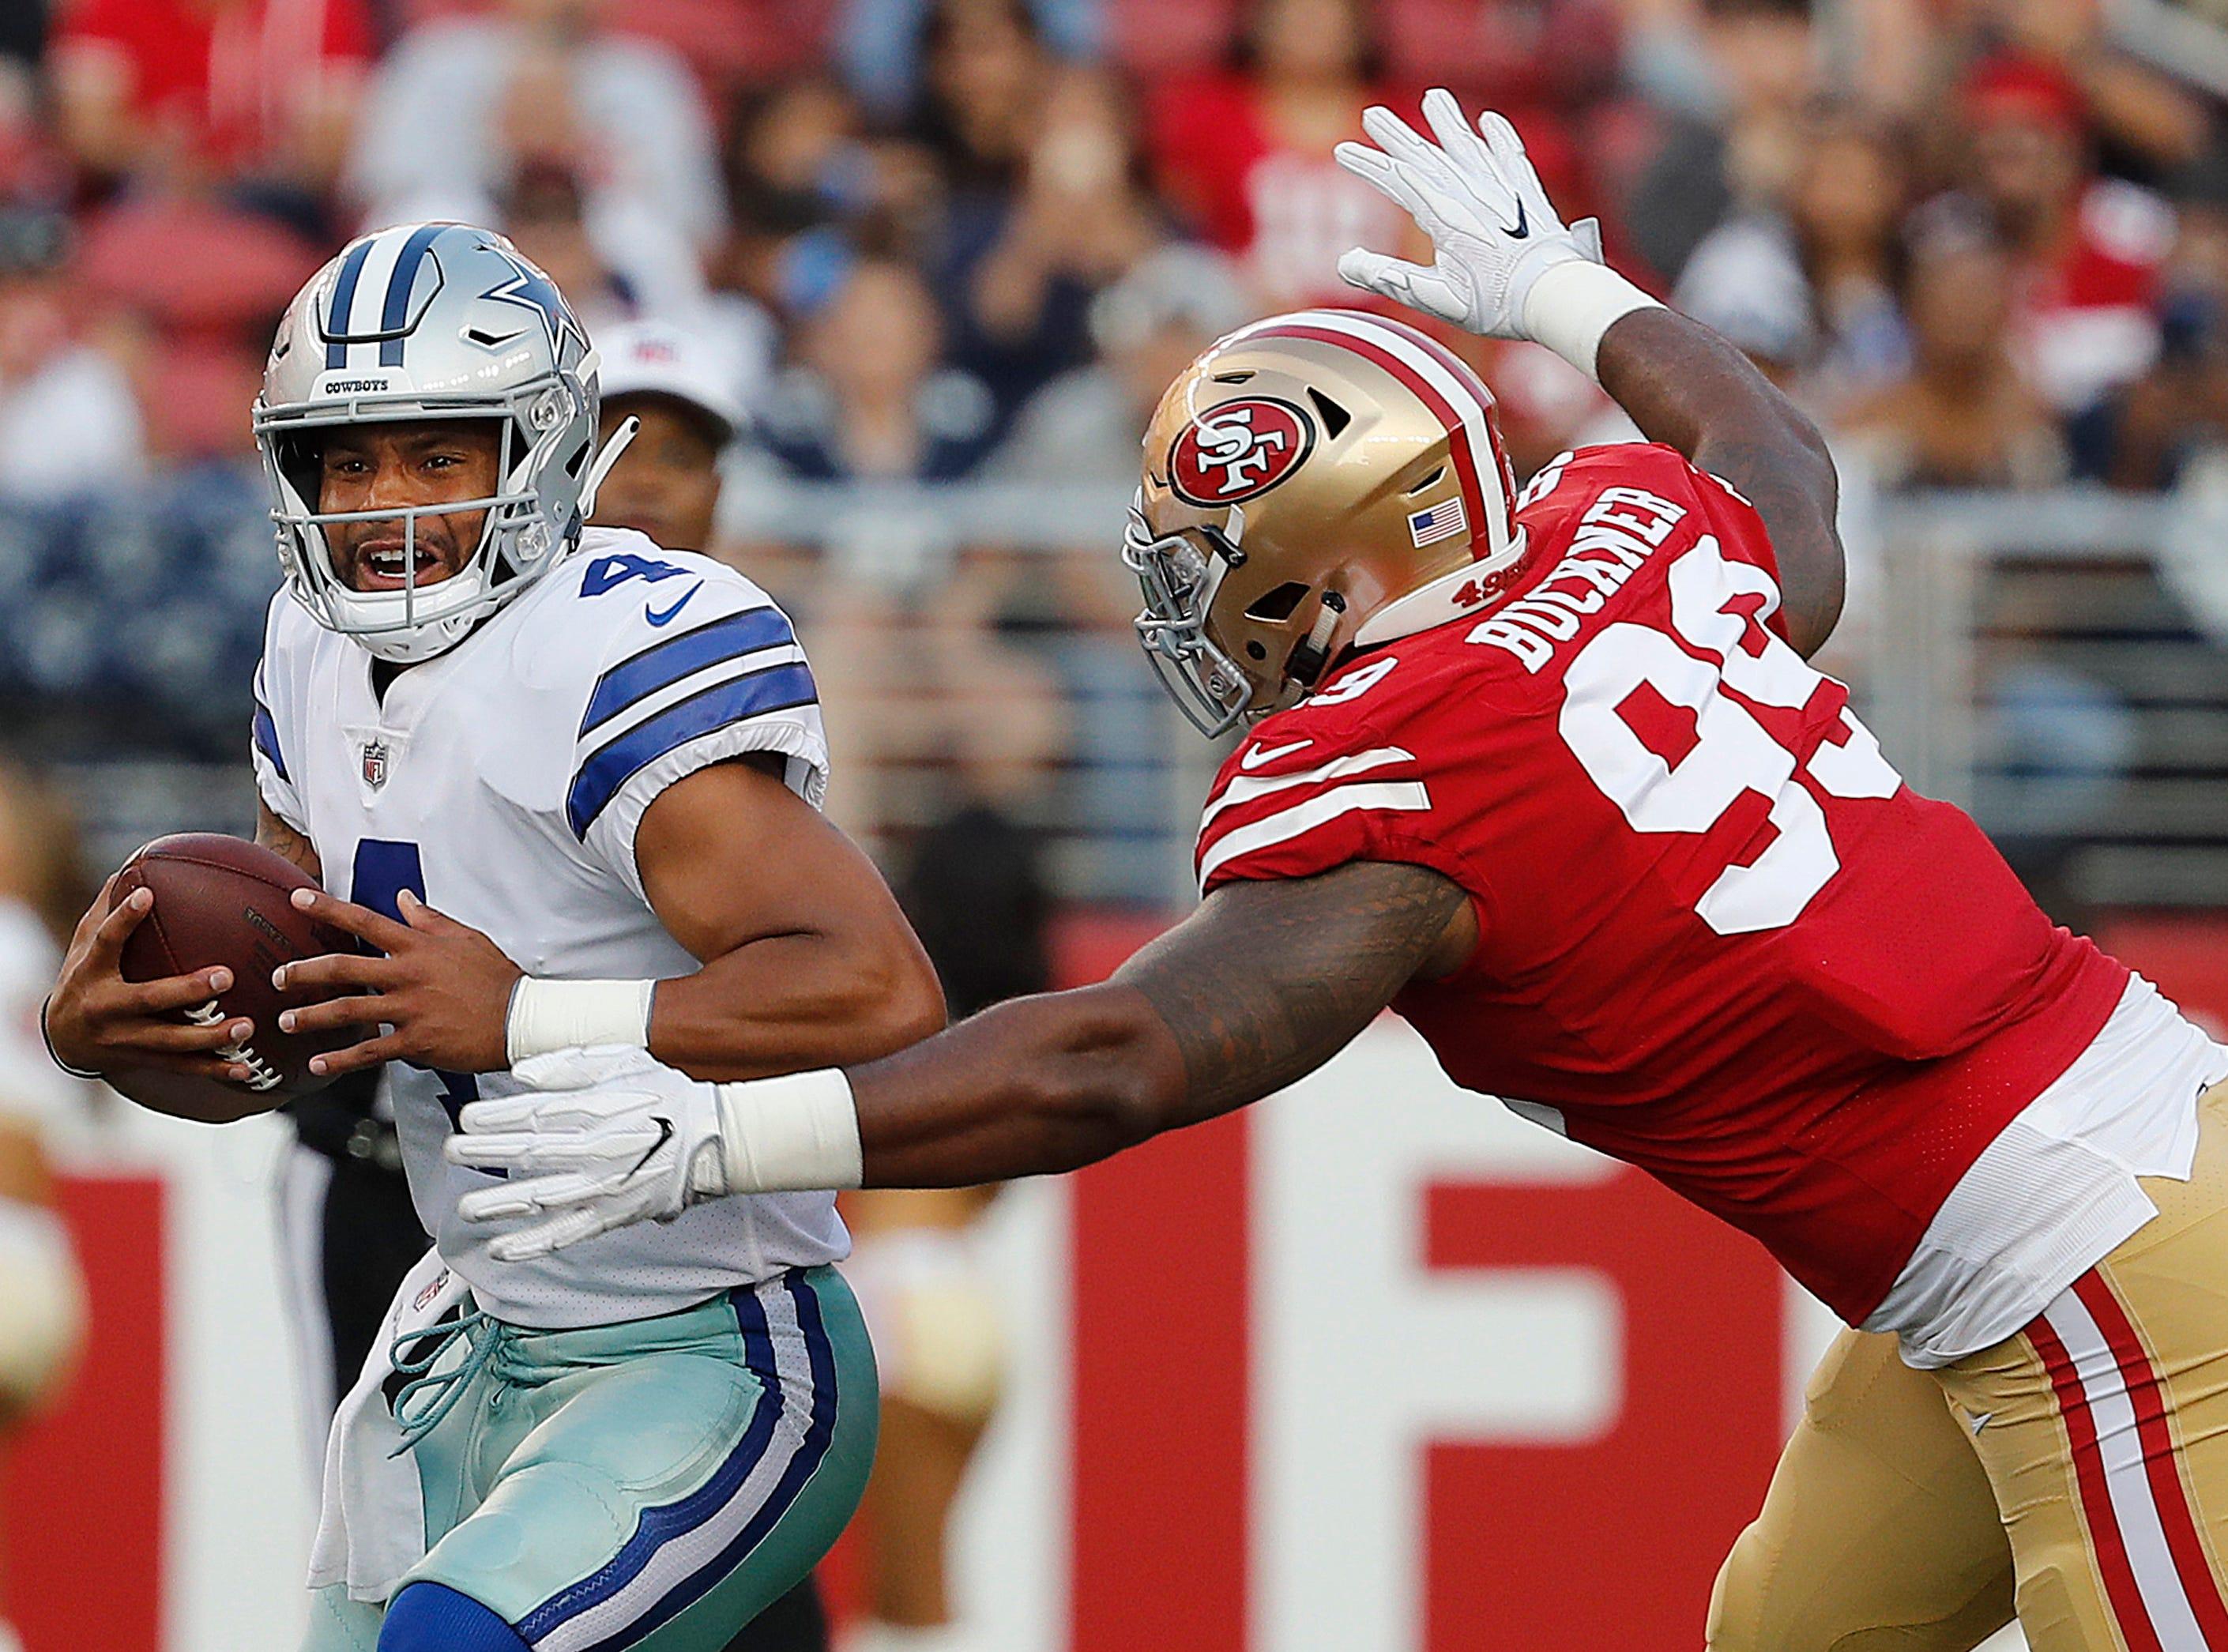 San Francisco 49ers defensive end DeForest Buckner (99) closes in to sack Dallas Cowboys quarterback Dak Prescott (4) during the first half of an NFL preseason football game in Santa Clara, Calif., Thursday, Aug. 9, 2018. (AP Photo/Josie Lepe)